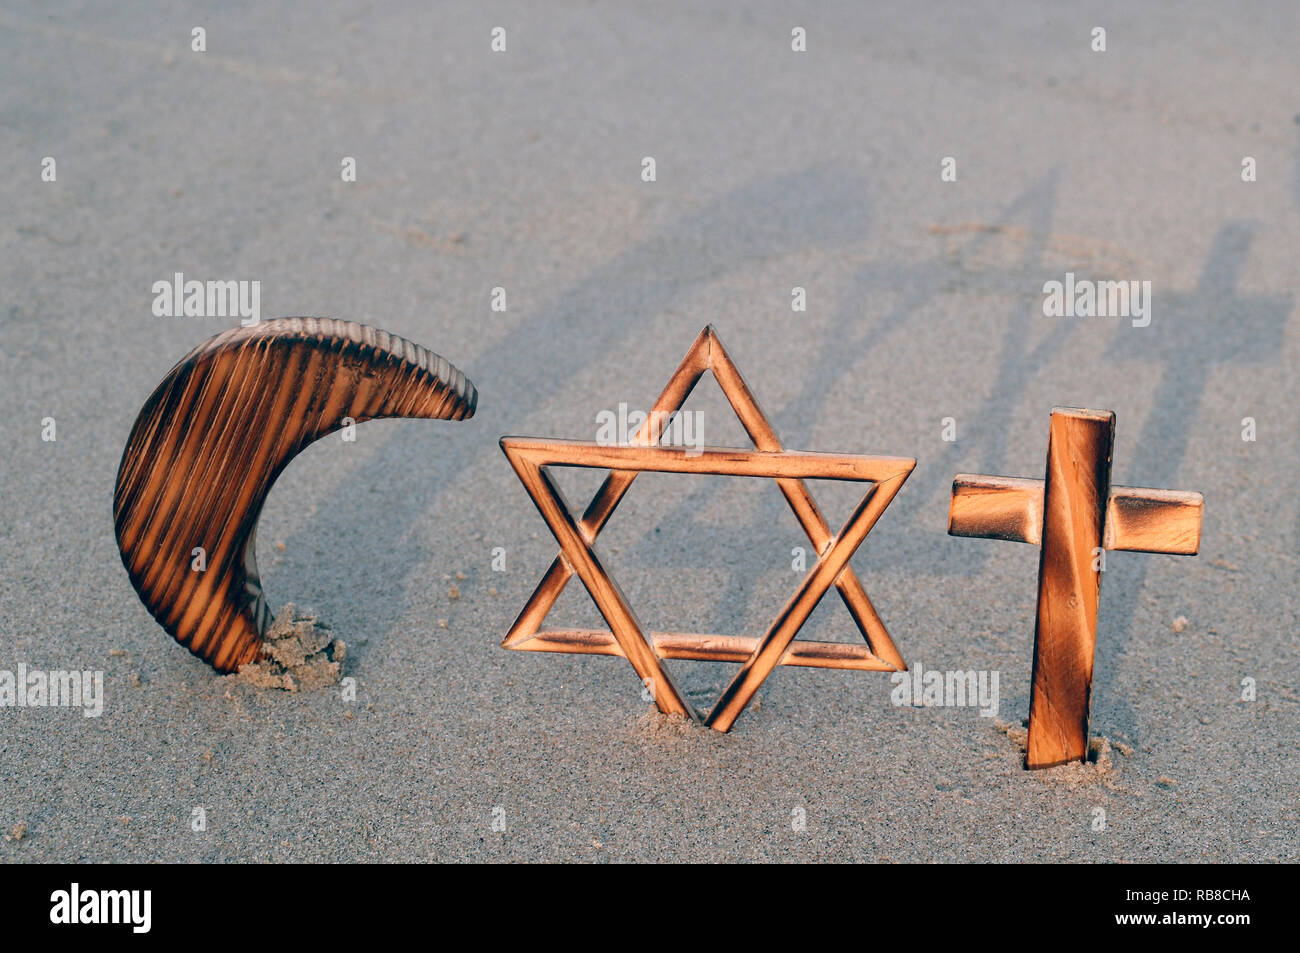 Symboles interreligieux. Christianity, Islam, Judaism 3 monotheistic religions. Jewish Star, Cross and Crescent : Interreligious symbols. - Stock Image